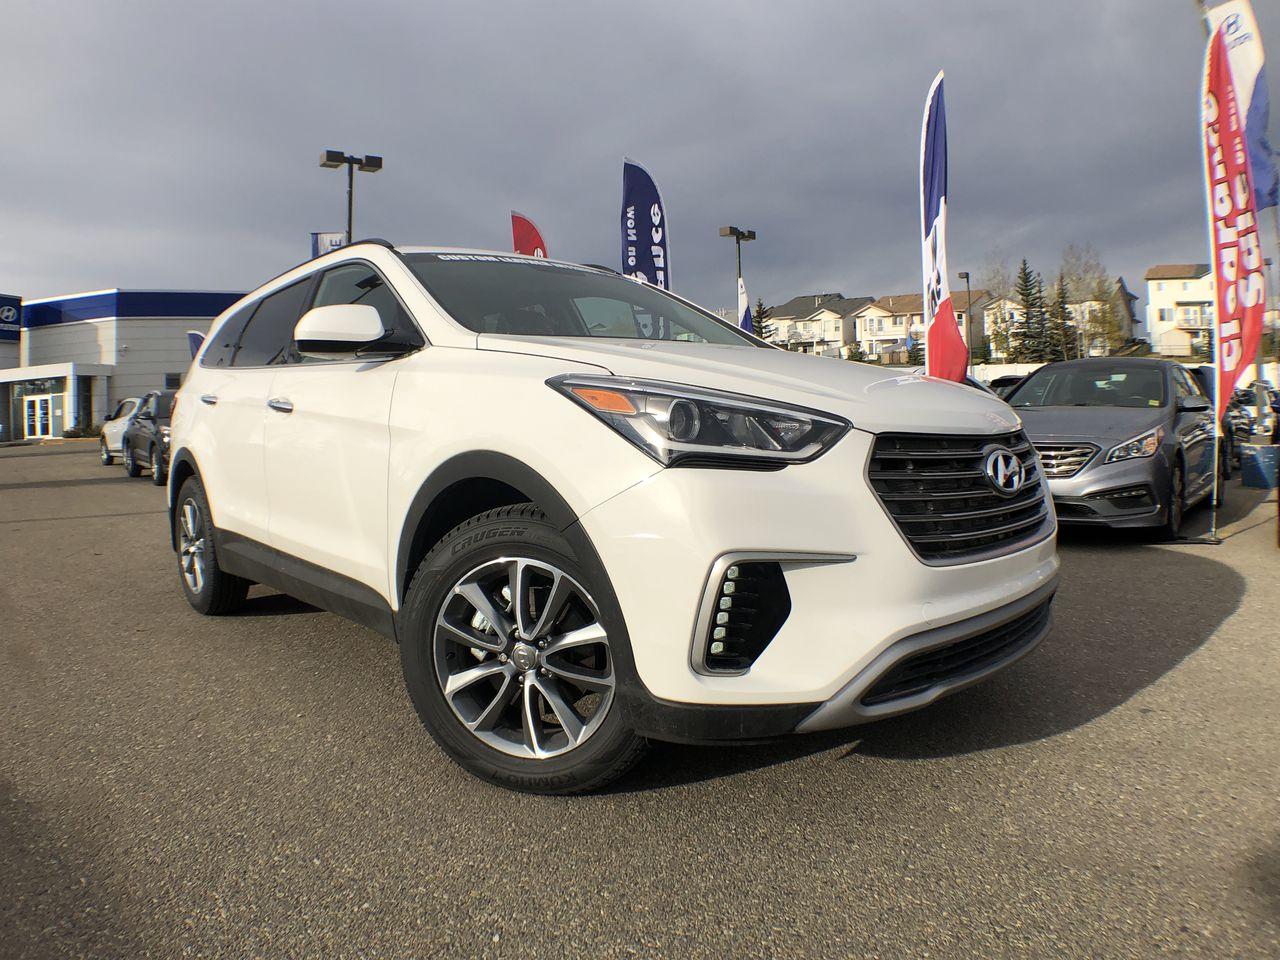 New 2018 Hyundai Santa Fe XL Base - CUSTOM LEATHER INTERIOR! in ...